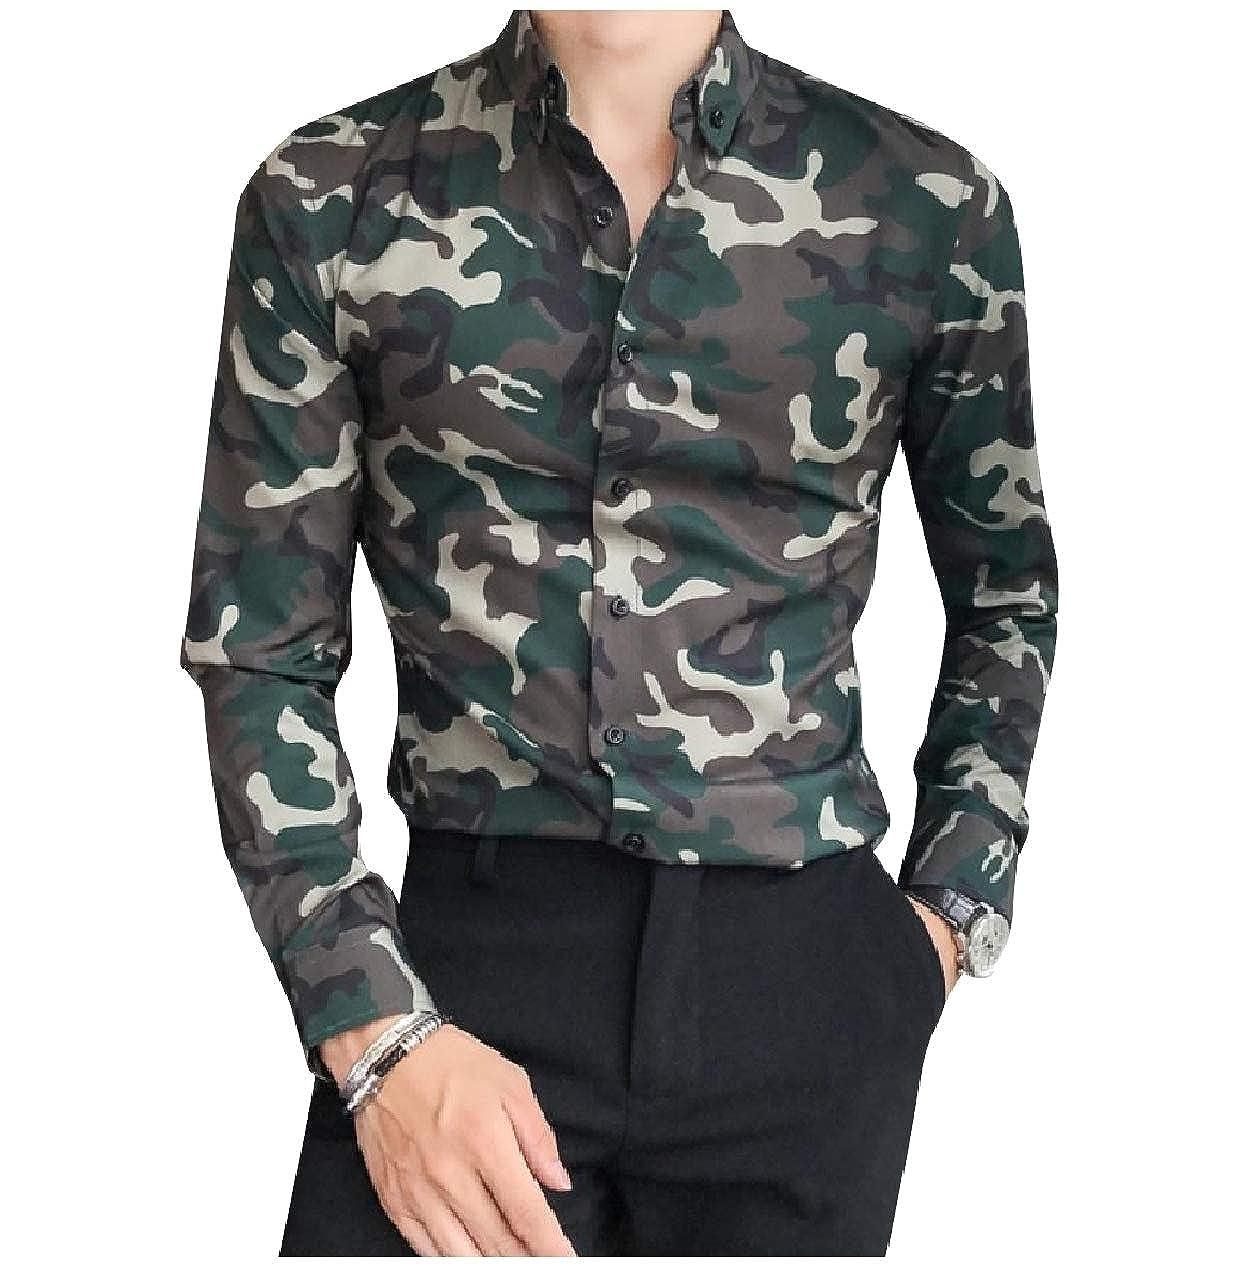 Winwinus Mens Long-Sleeve Camouflage Floral Print Slim Fitted Shirt Tops